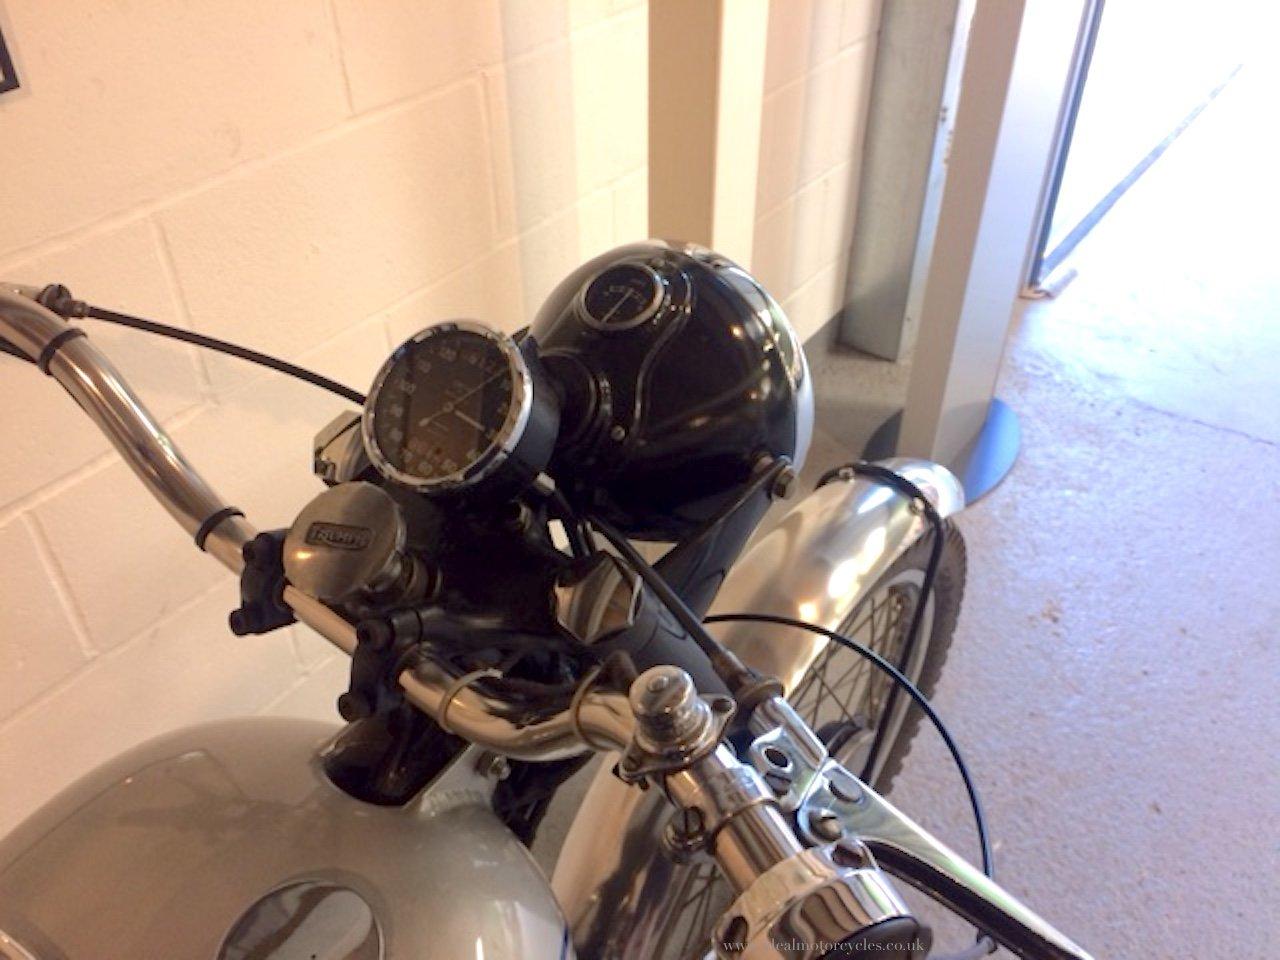 1952 Triumph Trophy Special 500cc For Sale (picture 7 of 8)